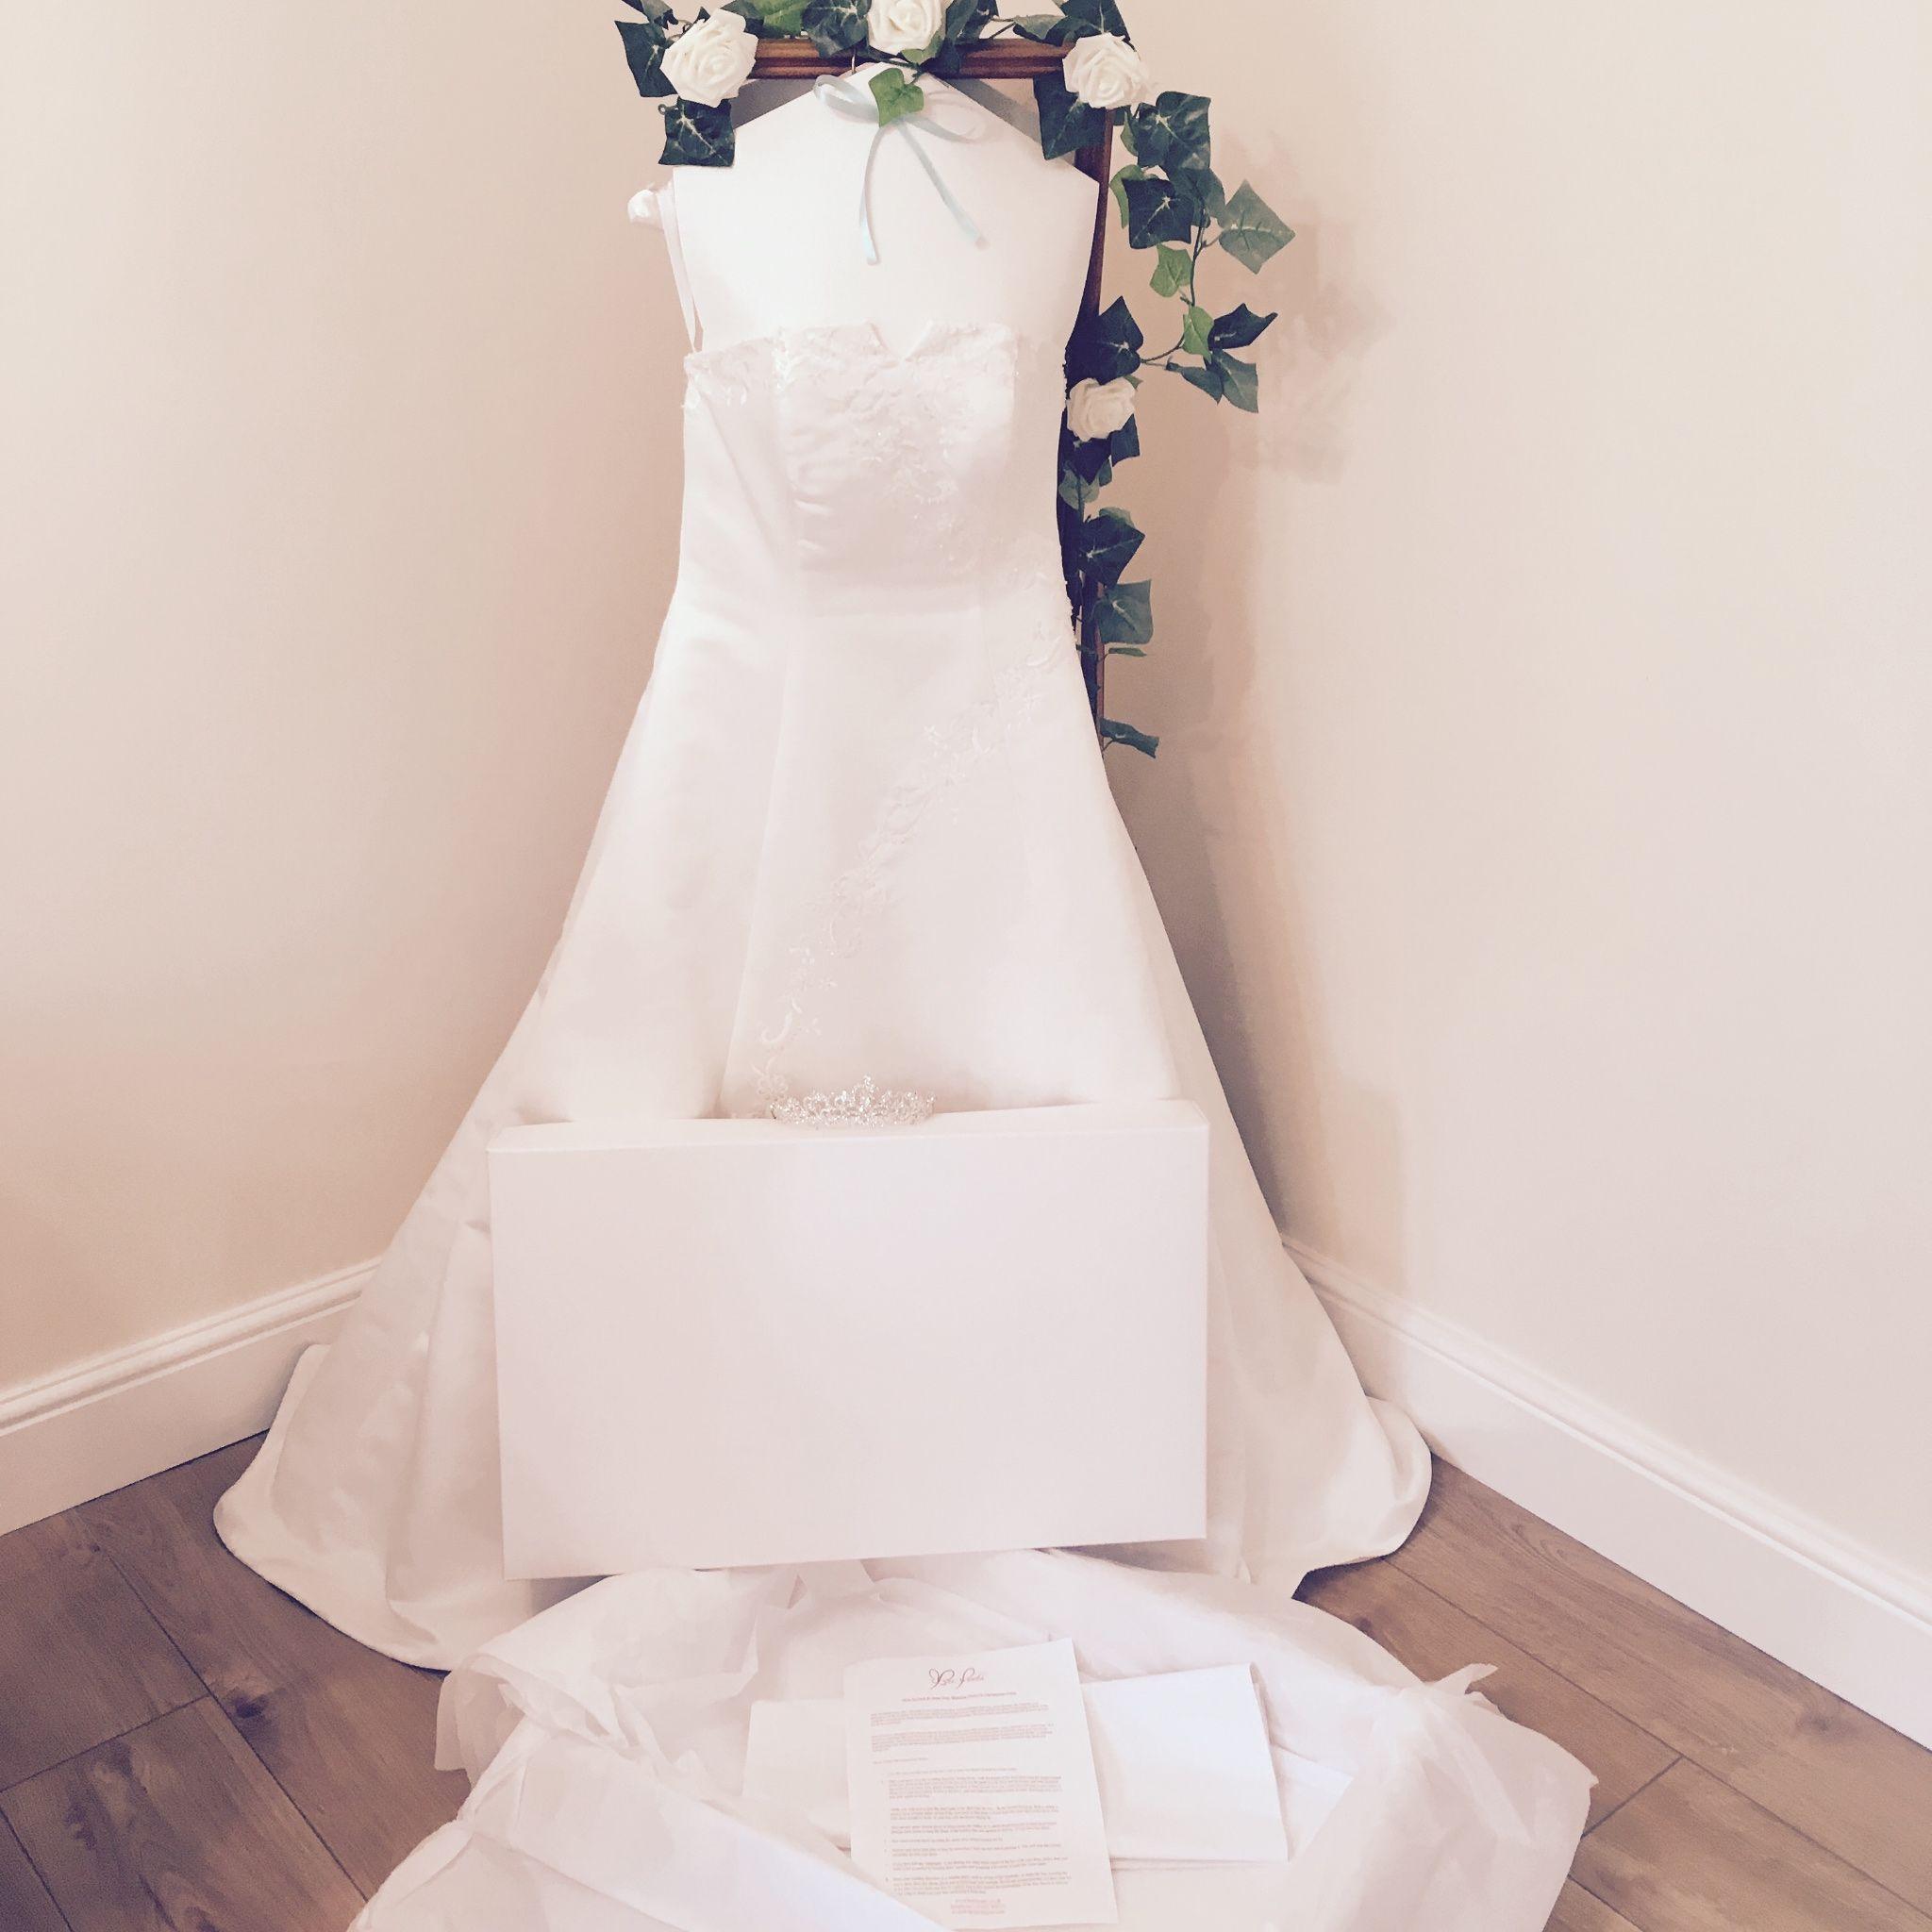 Large Wedding Dress Storage Box White